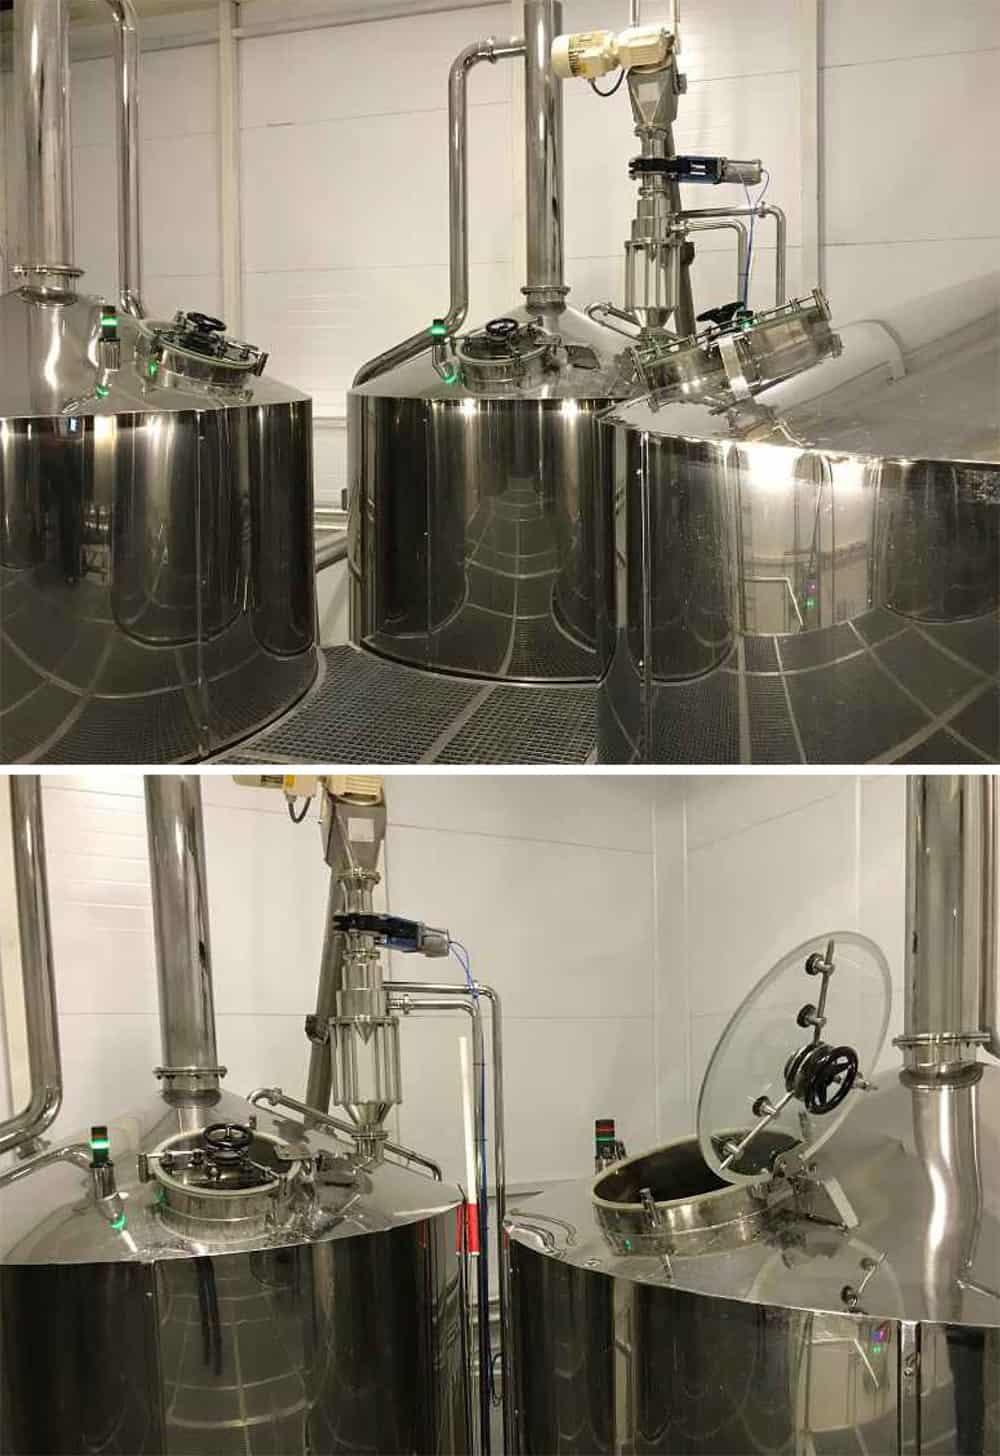 BH BWOP 6000 photo brewhouse 01 - BREWORX OPPIDUM 6000 : Wort brew machine - the brewhouse